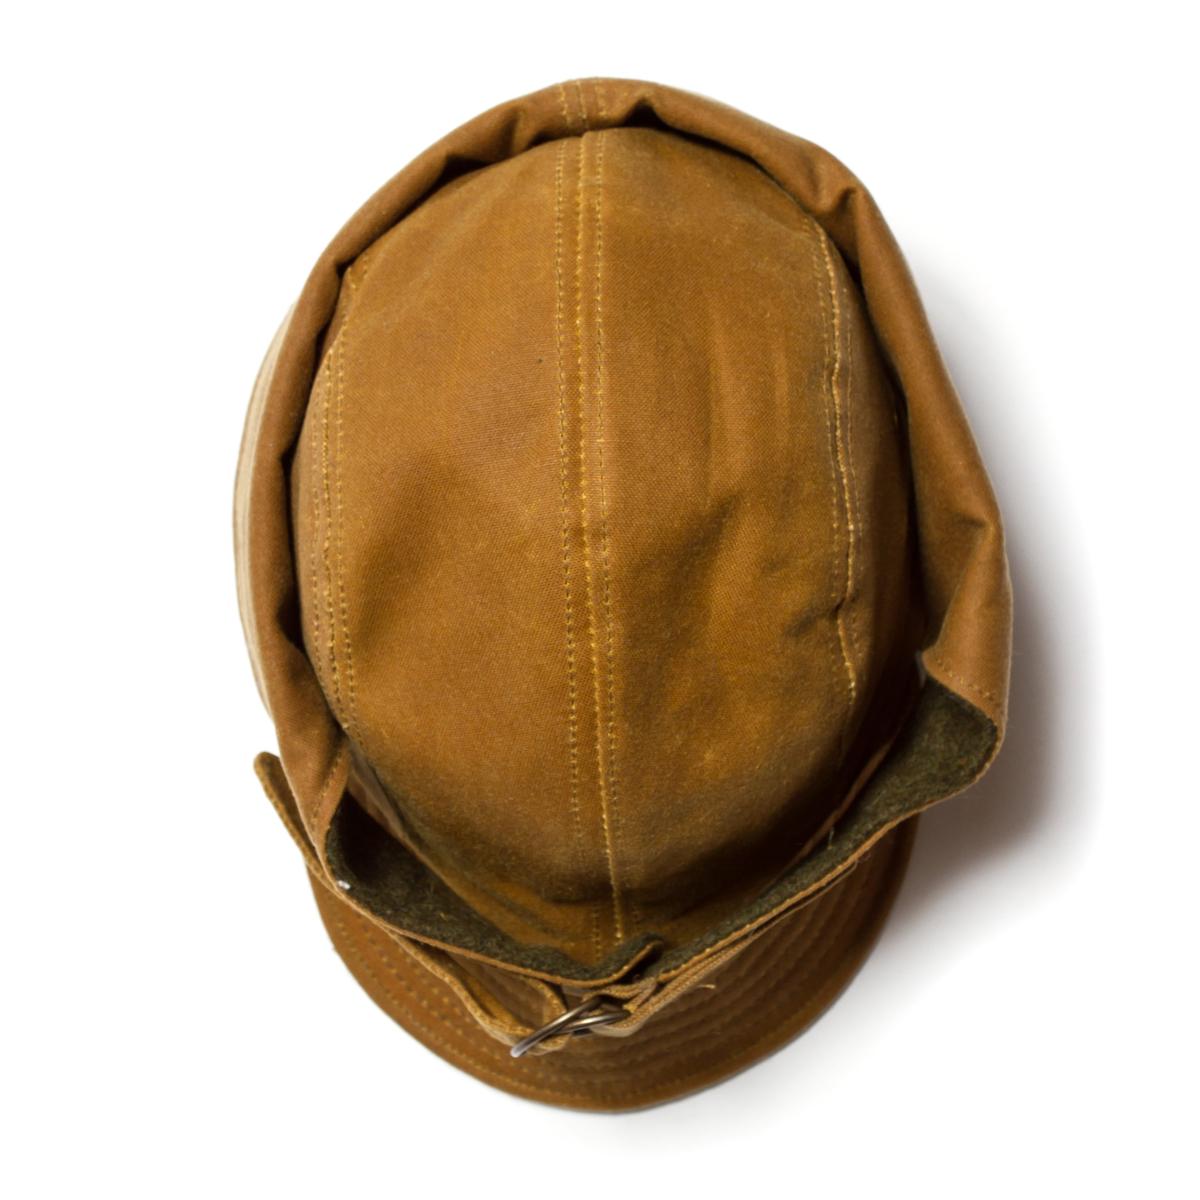 Filson Tin Cloth Wildfowl Hat £58